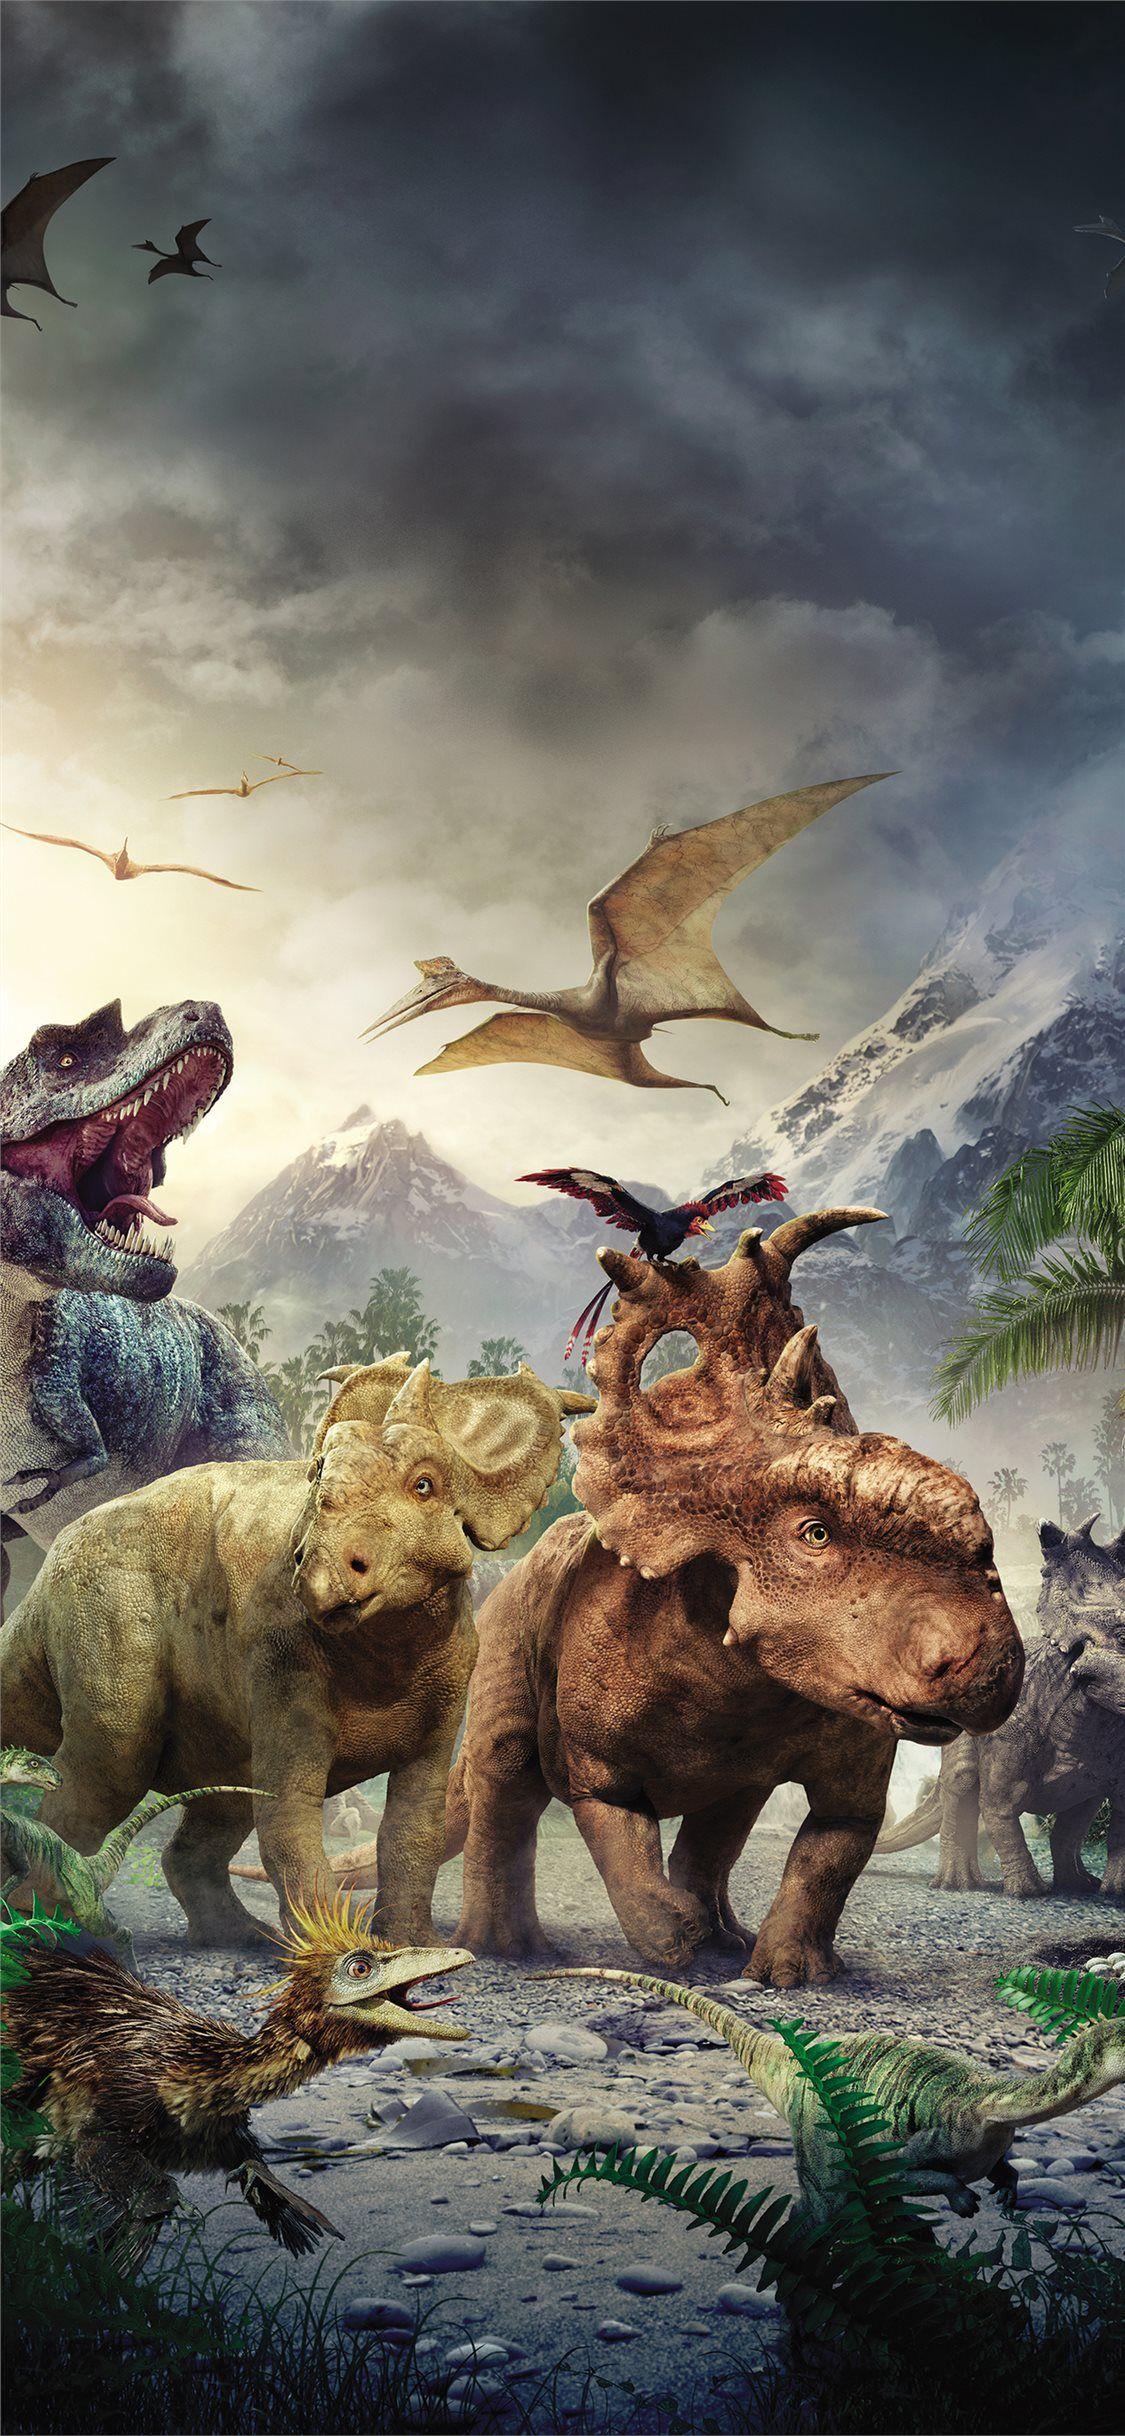 Walking With The Dinosaurs Movies 4k 5k Dinosaur Wallpaper Mobile Wallpaper Walking With Dinosaurs